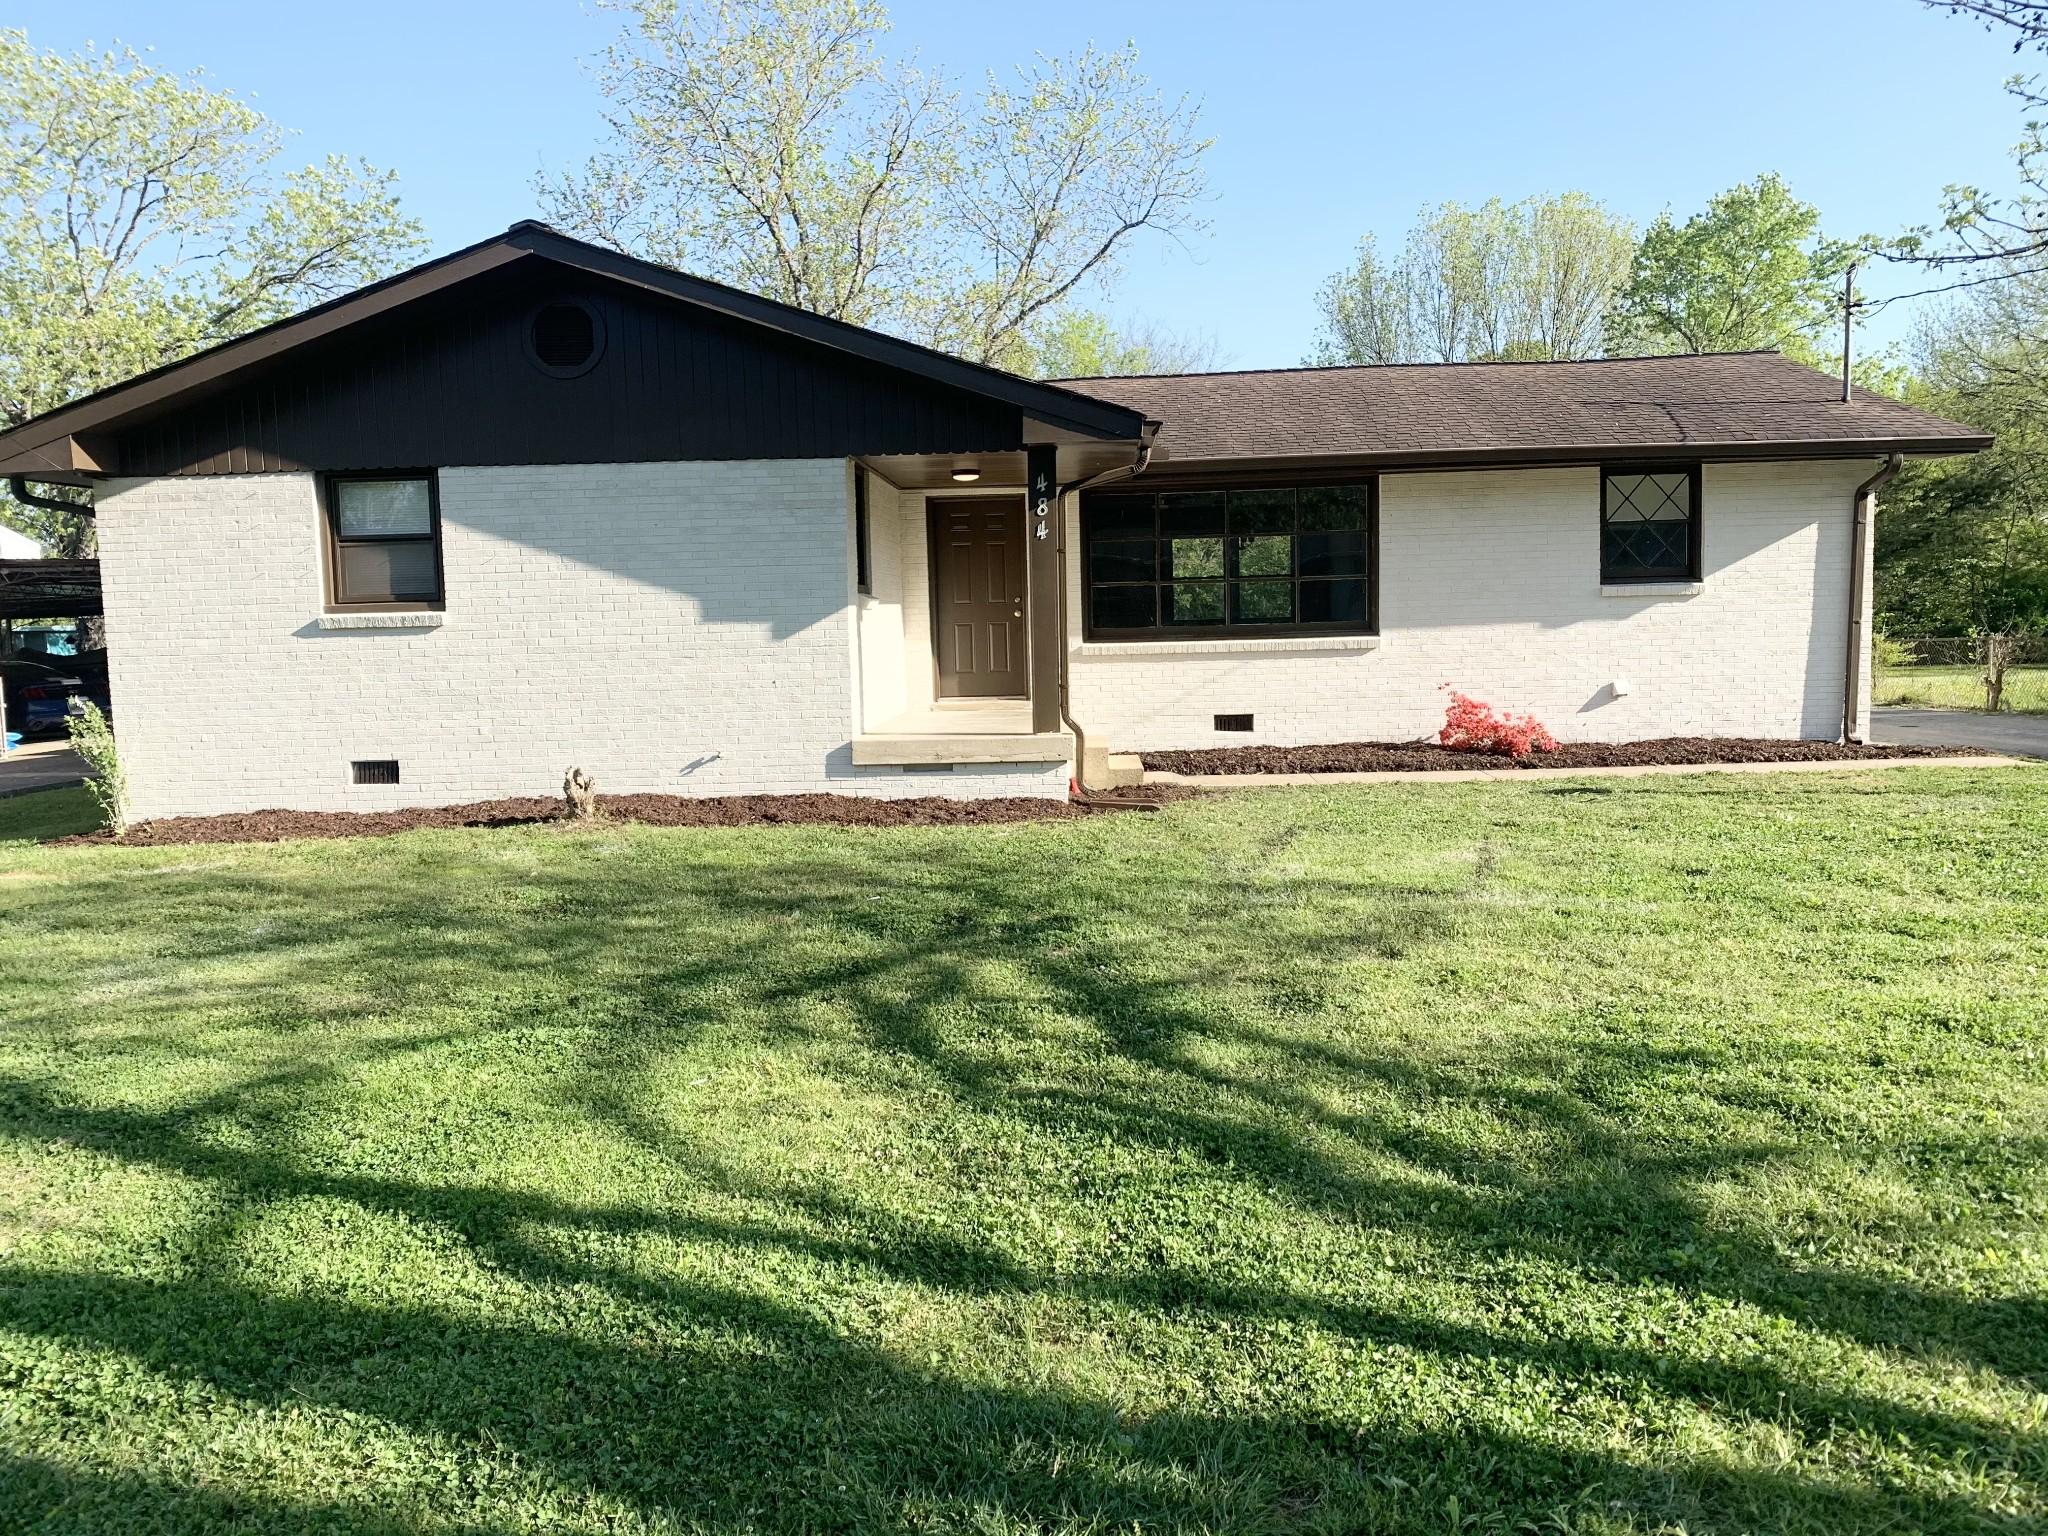 484 Rural Hill Rd Property Photo - Nashville, TN real estate listing